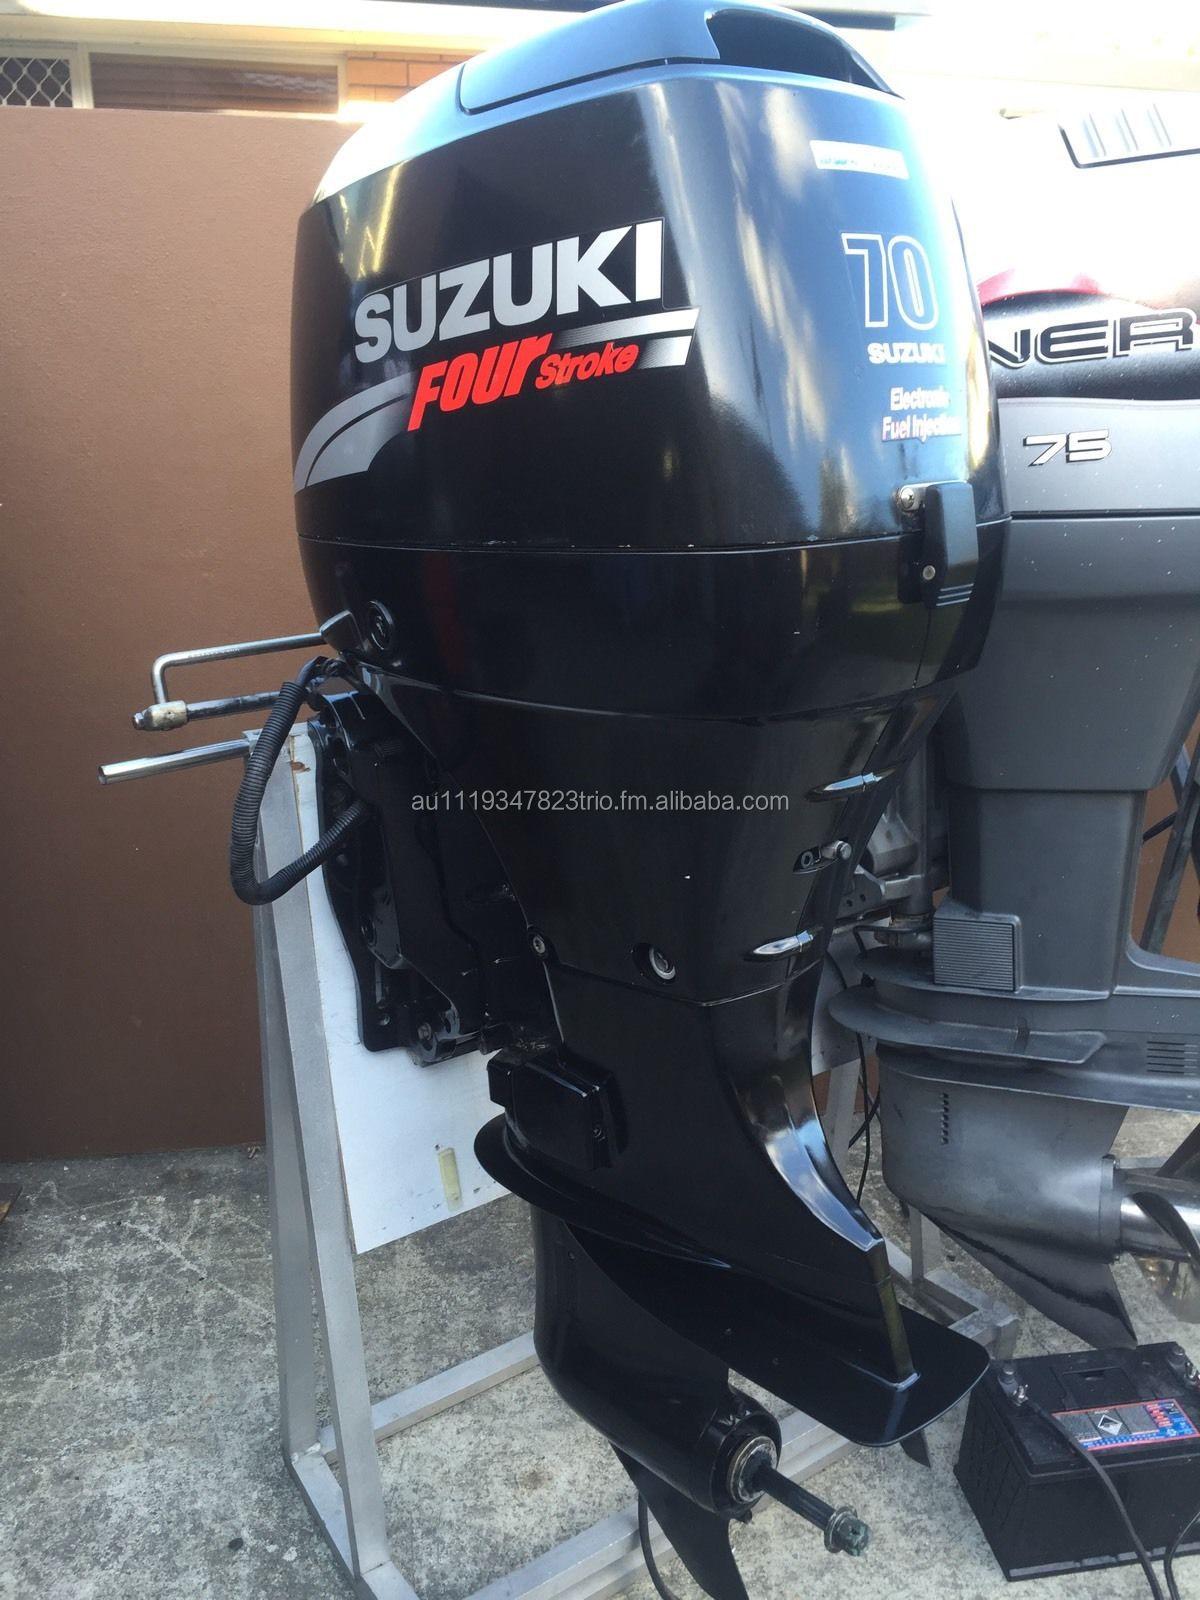 Used Suzuki 70 Hp 4 Stroke Outboard Motor Buy Marine Product On Alibaba Com